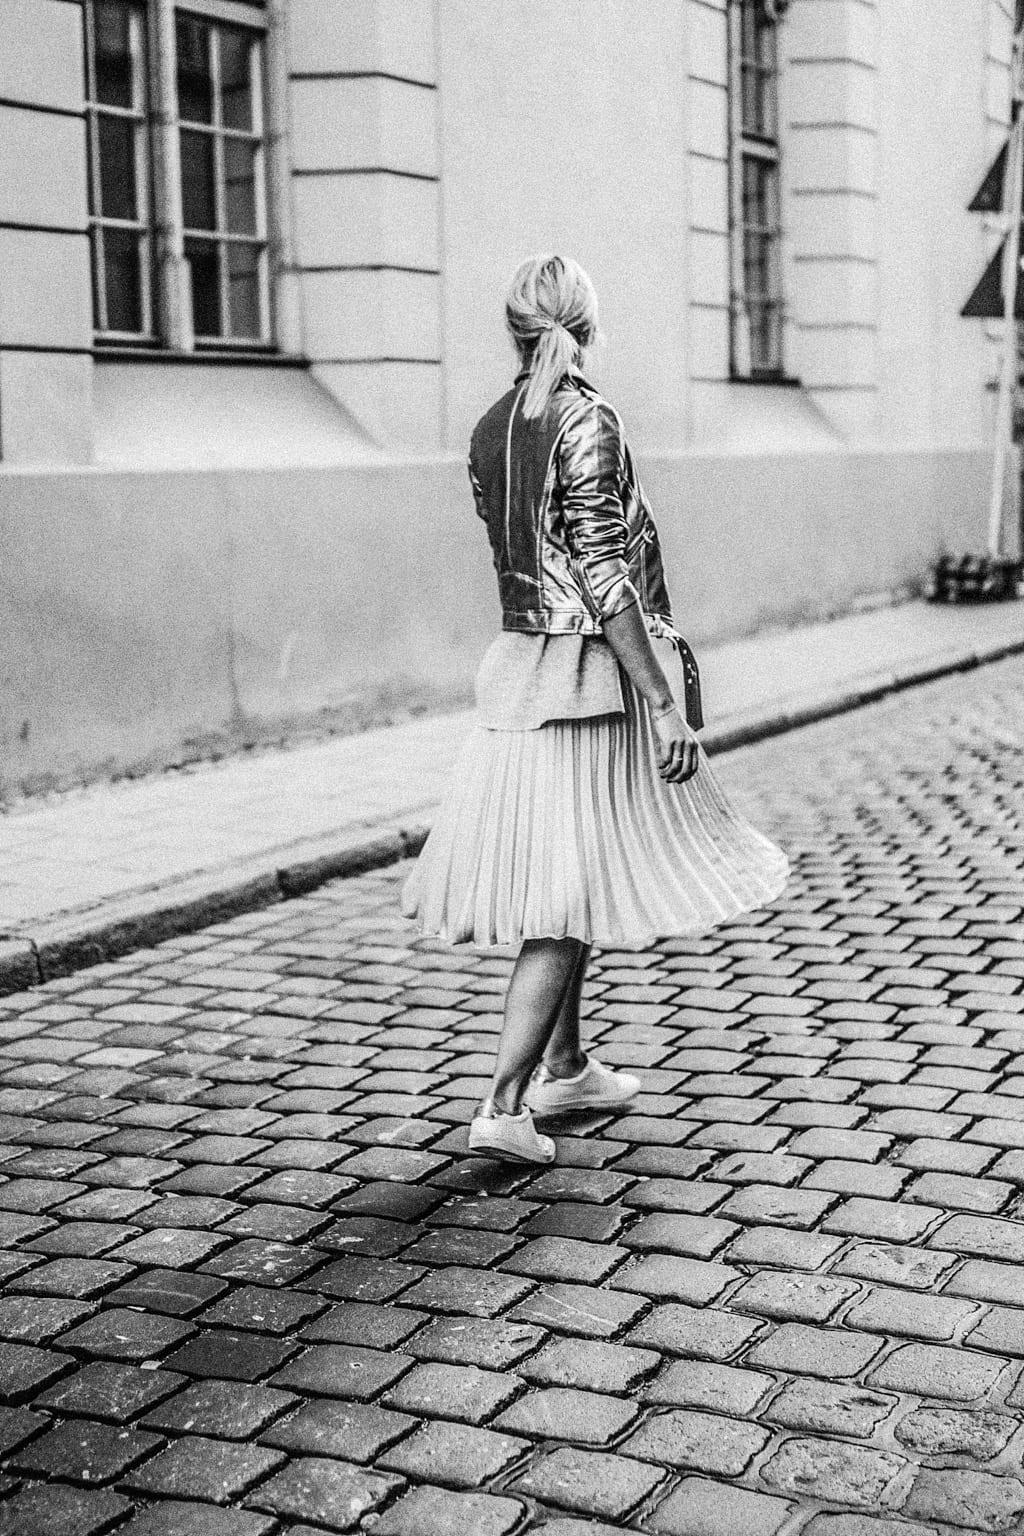 ck-constantlyk-com-karin-kaswurm-street-style-fashion-silver-leather-jacket-plissee-6800-2